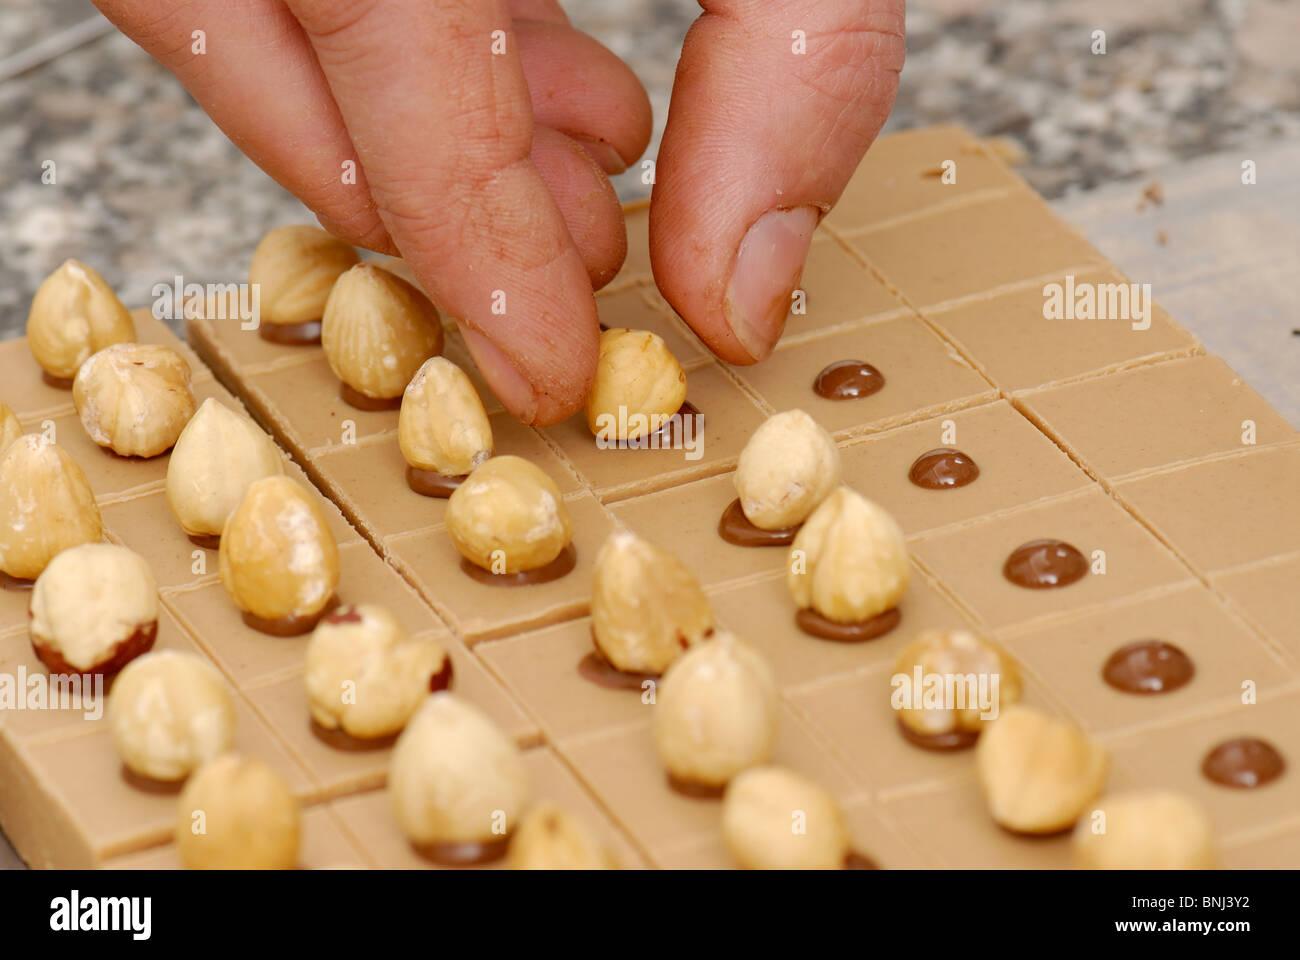 Fabricación de chocolates Imagen De Stock